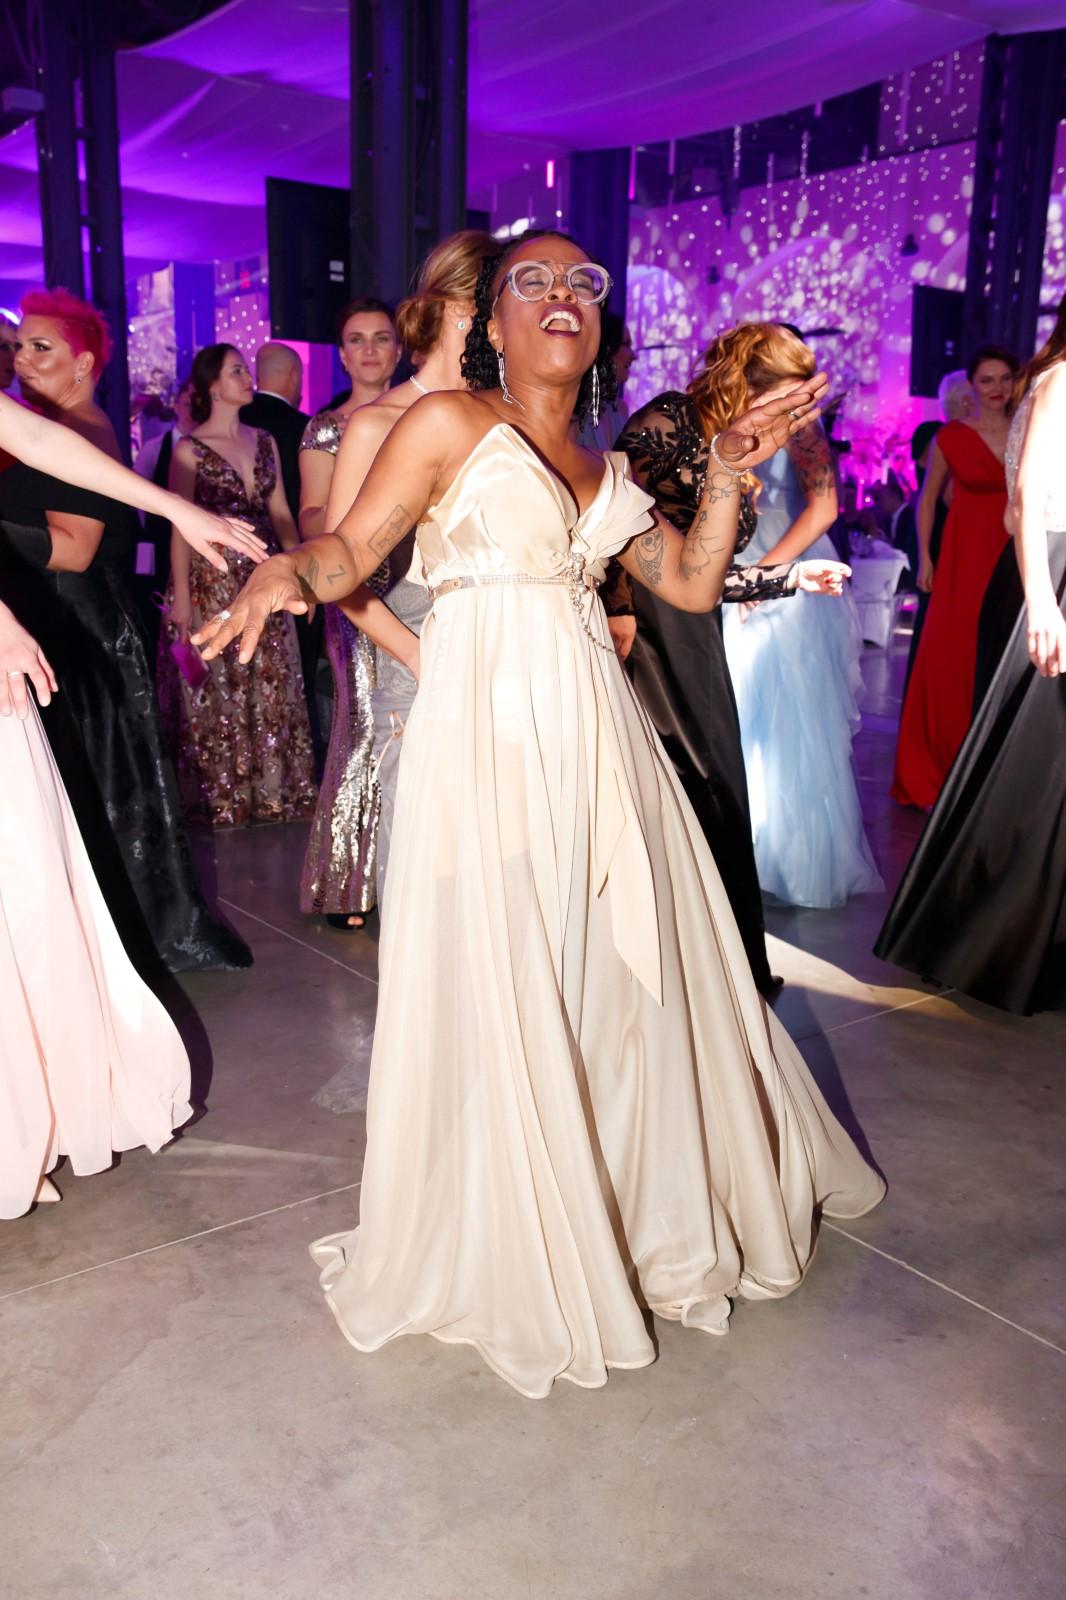 Ples jako Brno: Tonya Graves